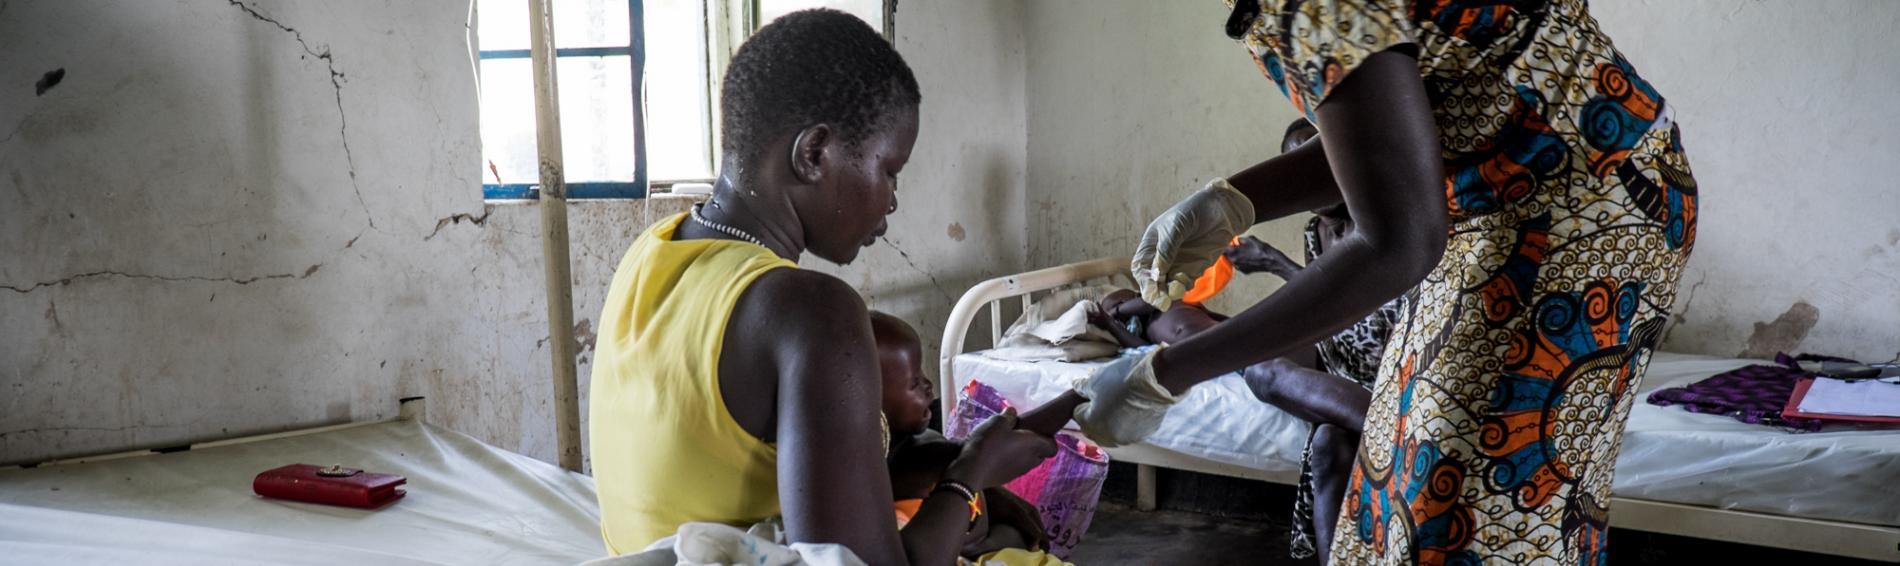 Medizinische Basisversorgung im Südsudan. Foto: Bruno Abarca